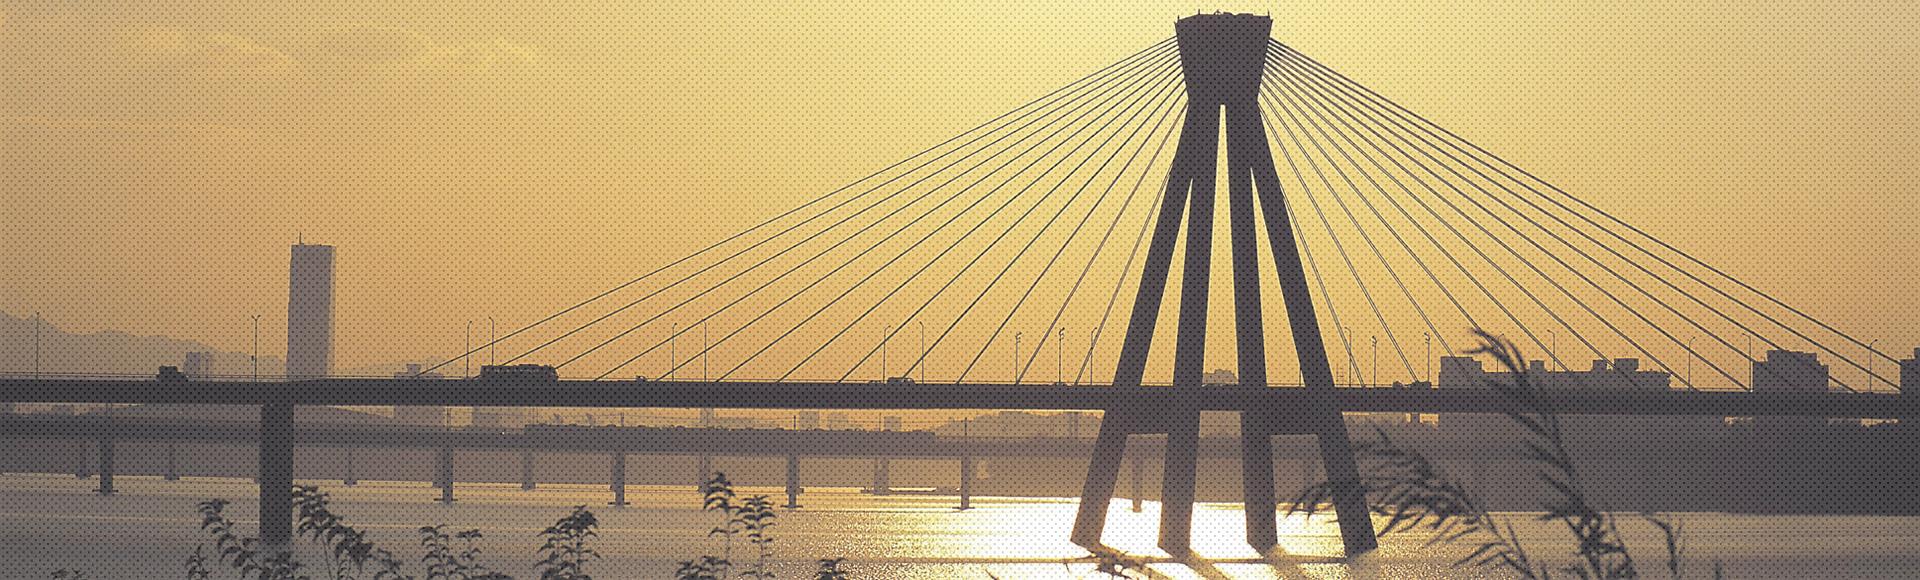 Clarke Bridges